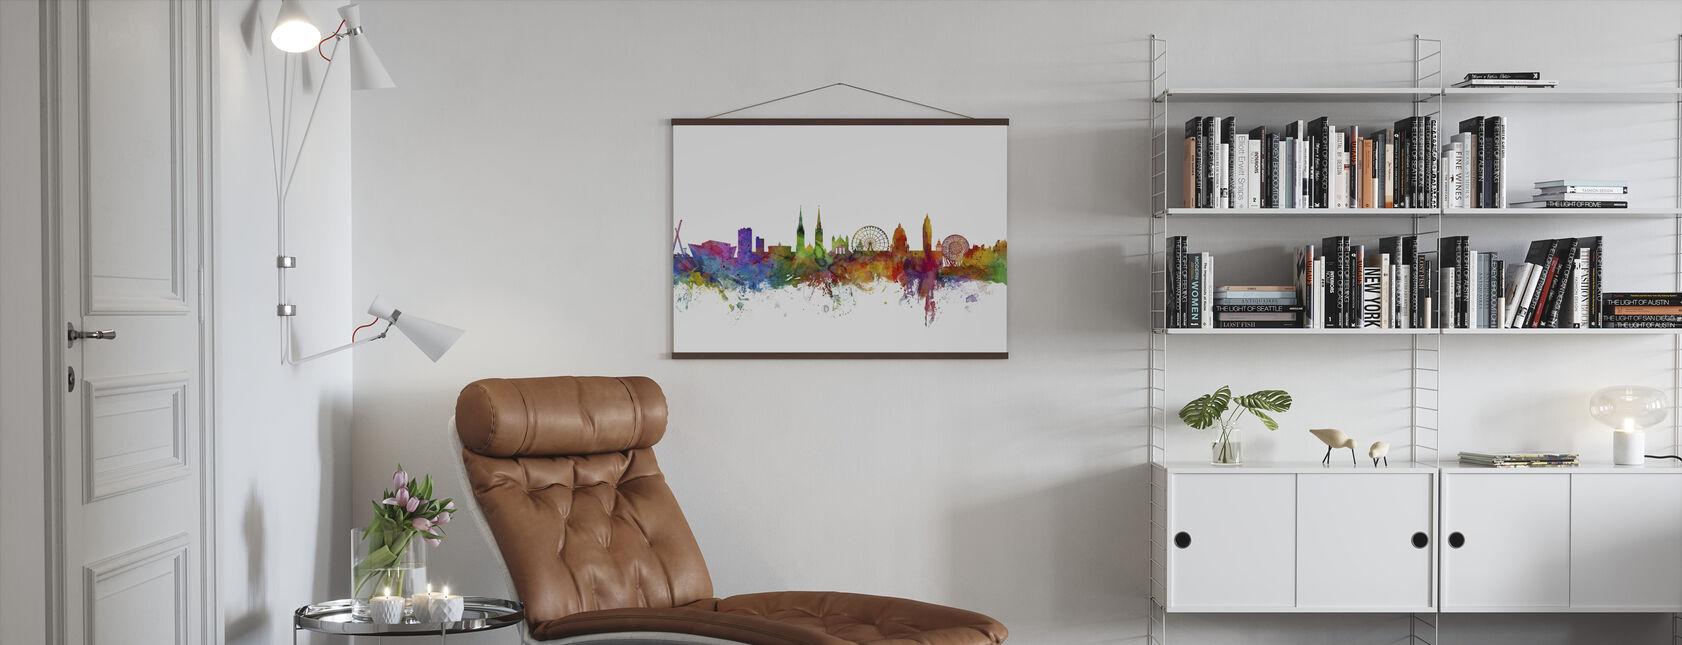 Belfast Northern Ireland Skyline - Poster - Living Room